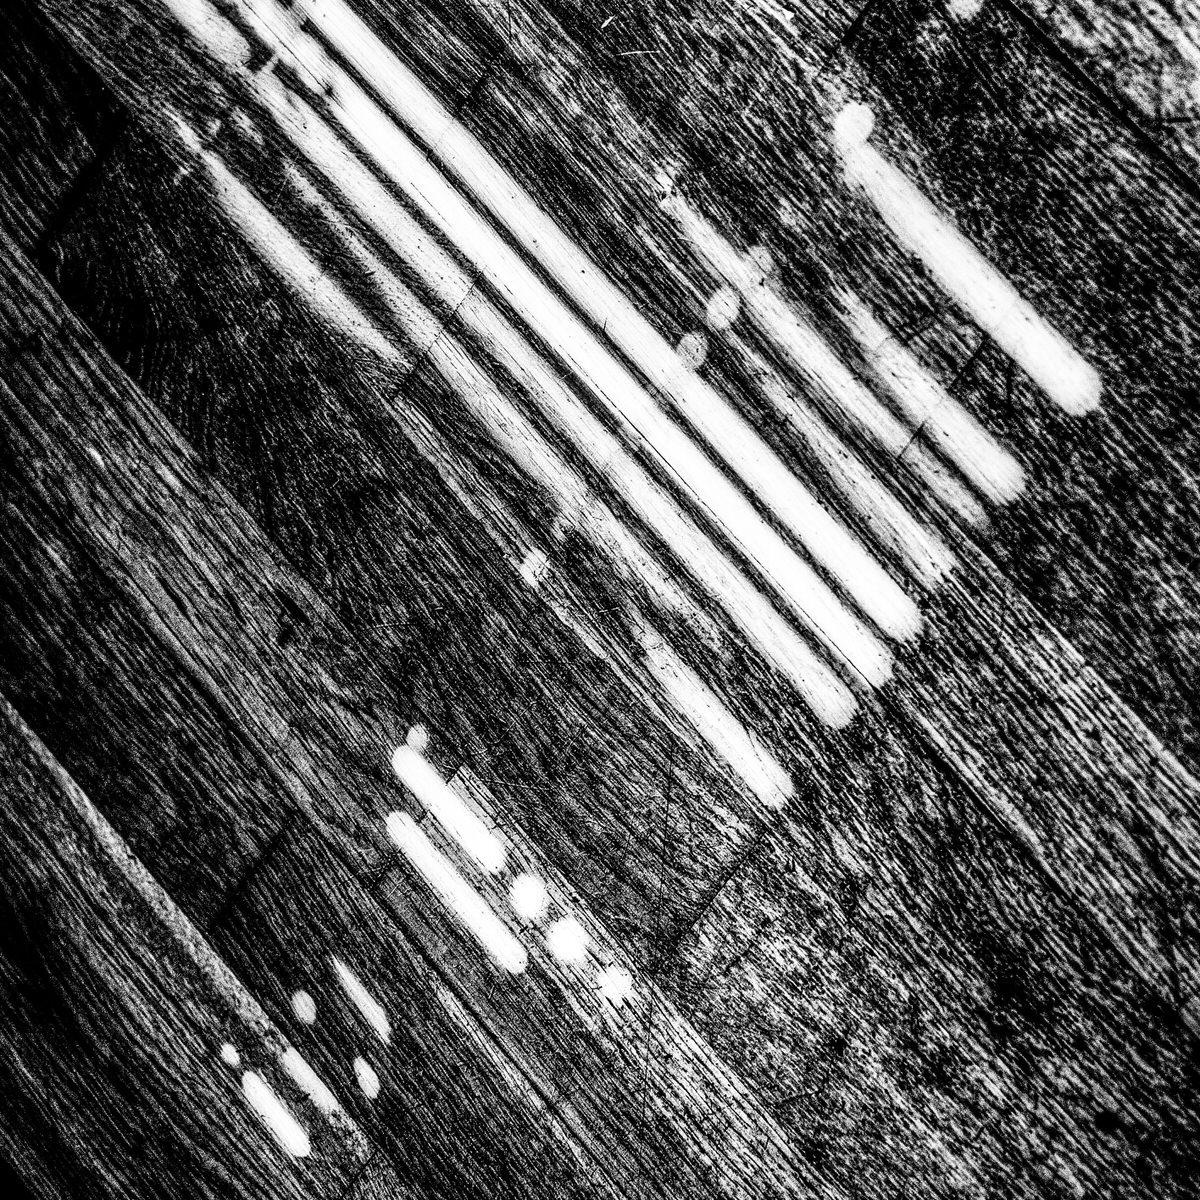 Série Variations (2) • Photo d'art • Tomasz Cichawa